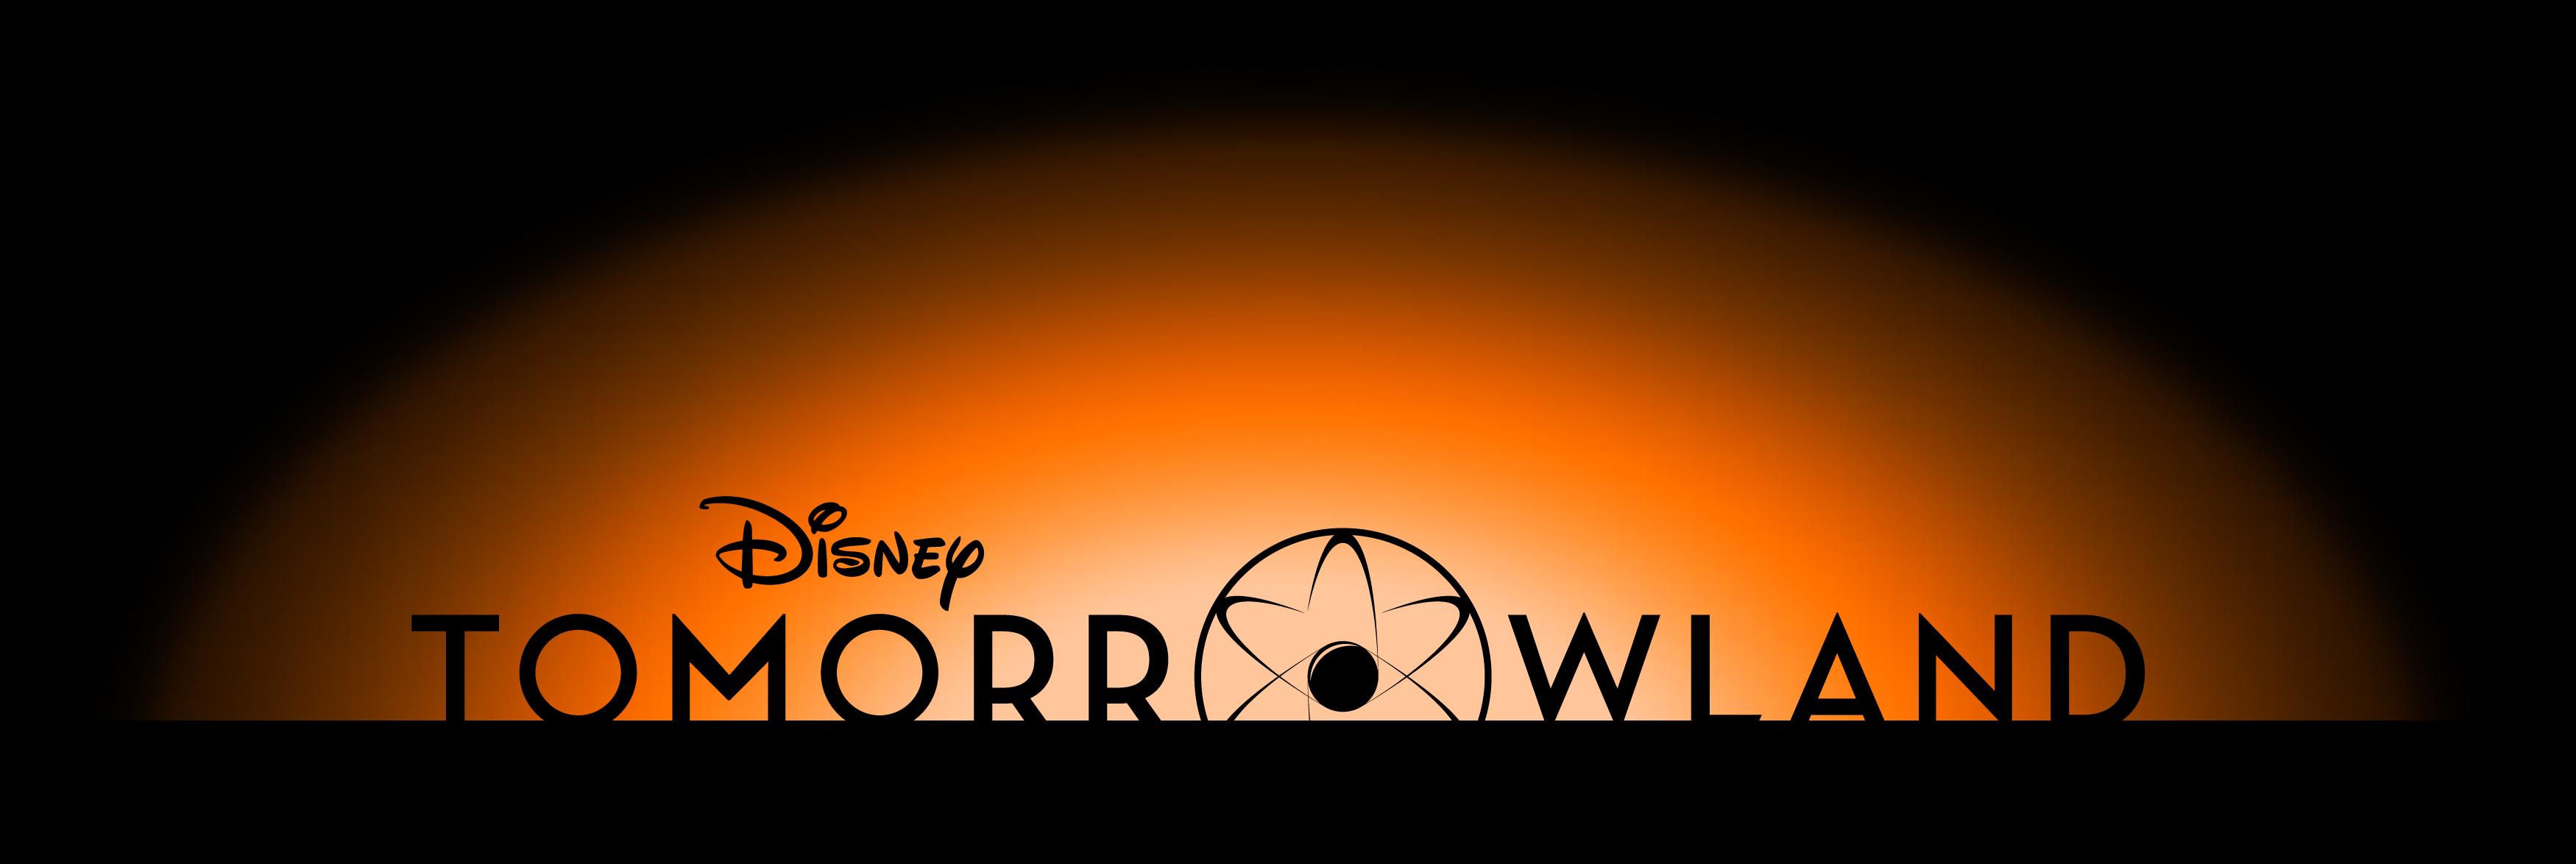 disney-tomorrowland-movie-2015-logo.jpg